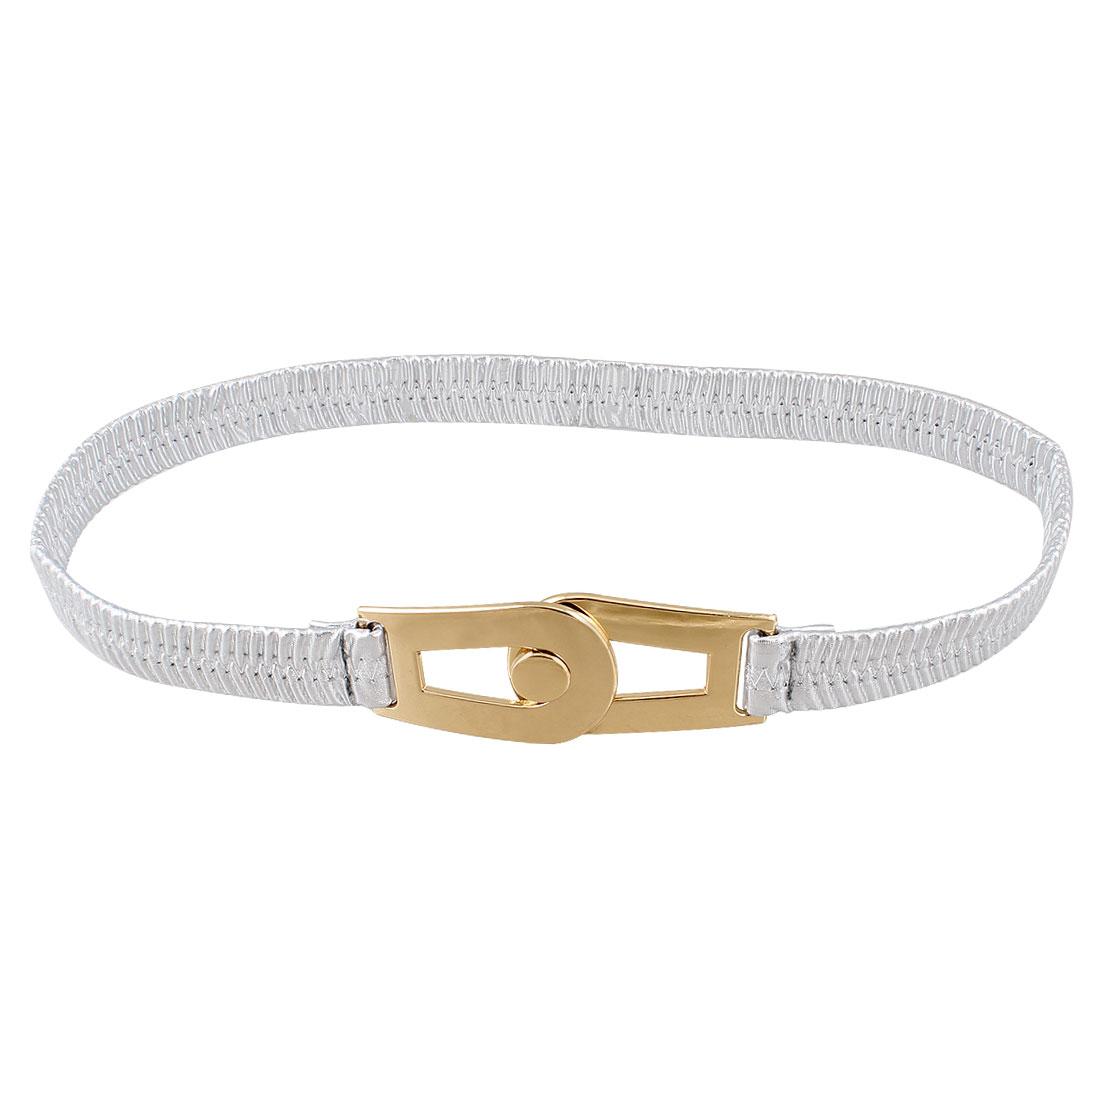 Silver Tone Faux Leather Interlocking Buckle Elastic Waist Cinch Belt for Woman